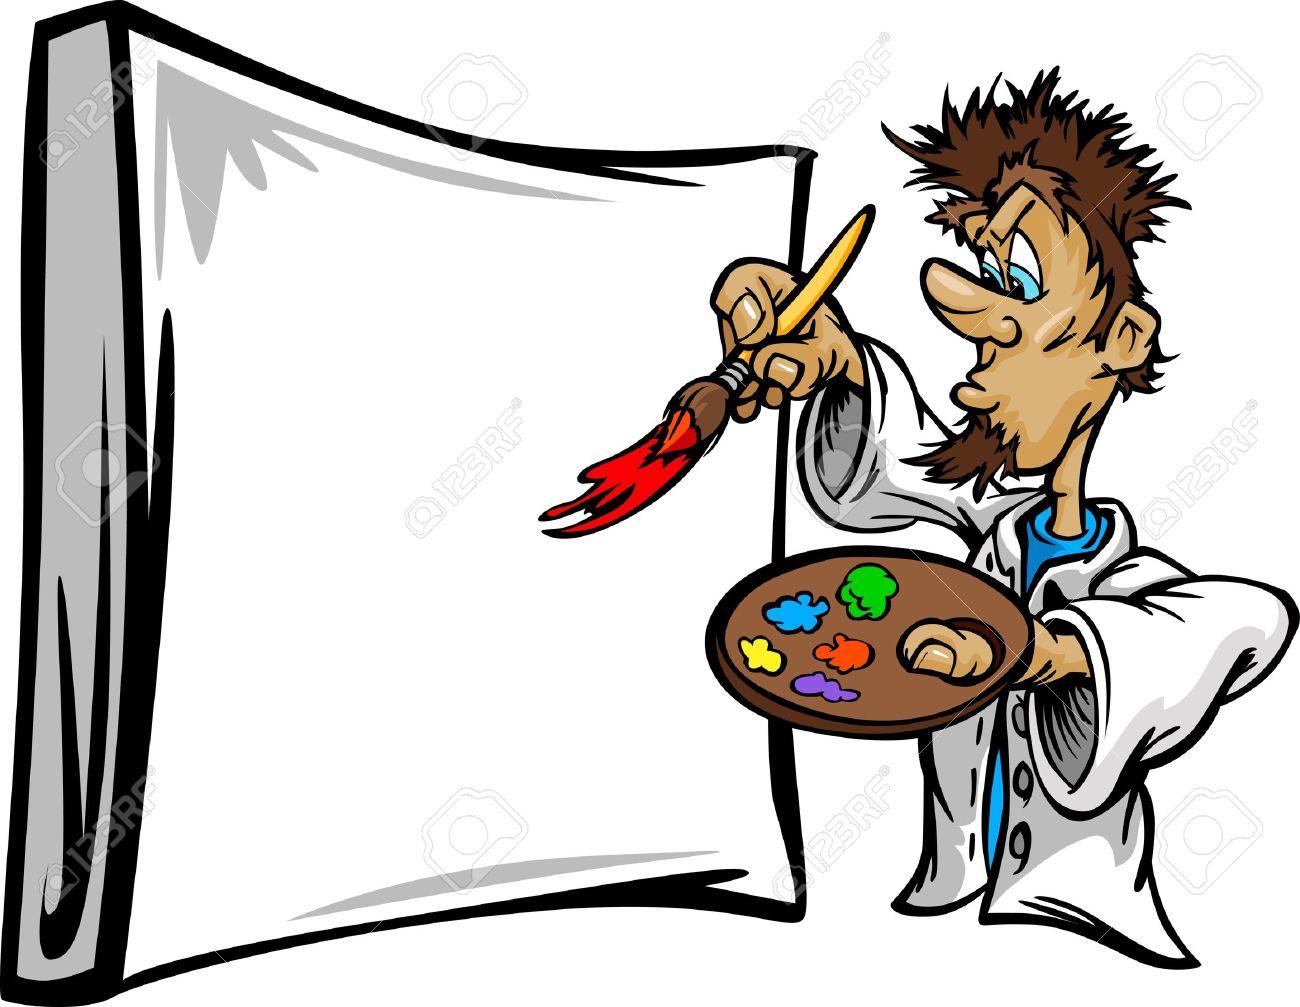 Cartoon Vector Image Of A Creative Artist Painter Holding A Paint